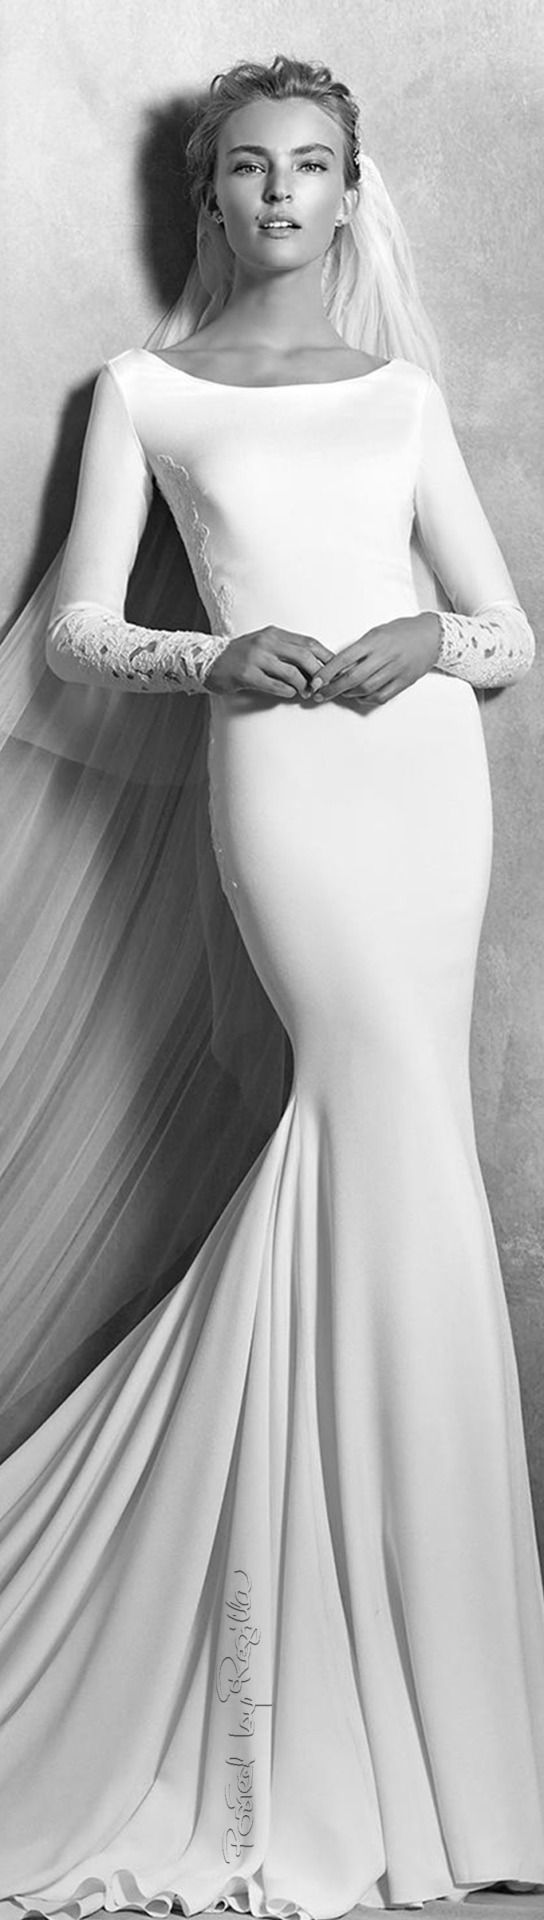 Regilla ⚜ Una Fiorentina in California | Wedding gowns | Pinterest ...